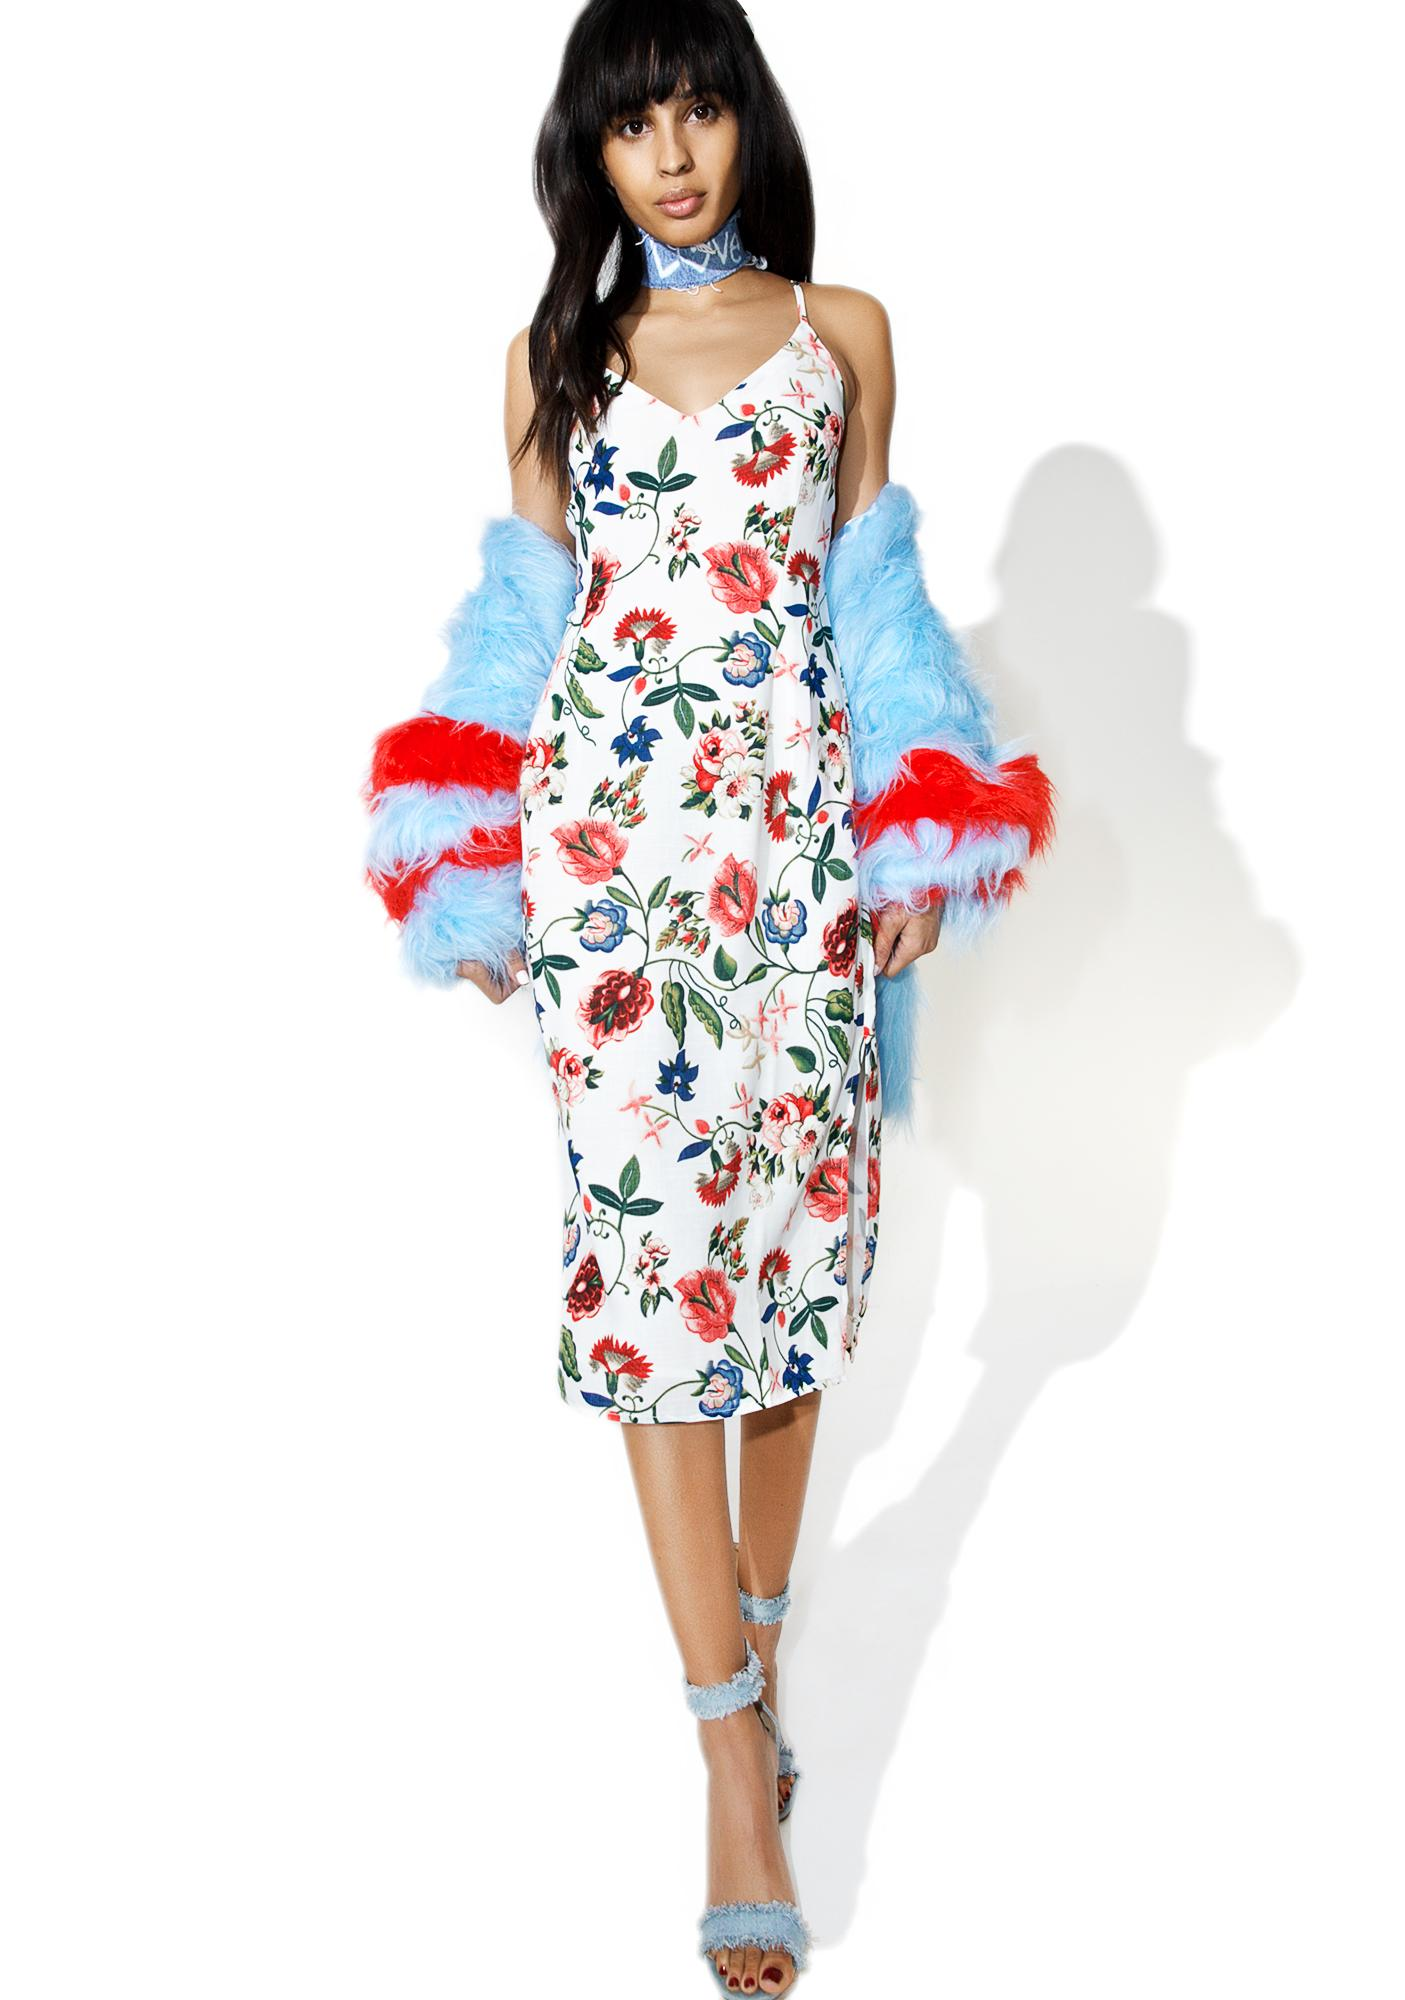 Norma Jean Floral Midi Dress